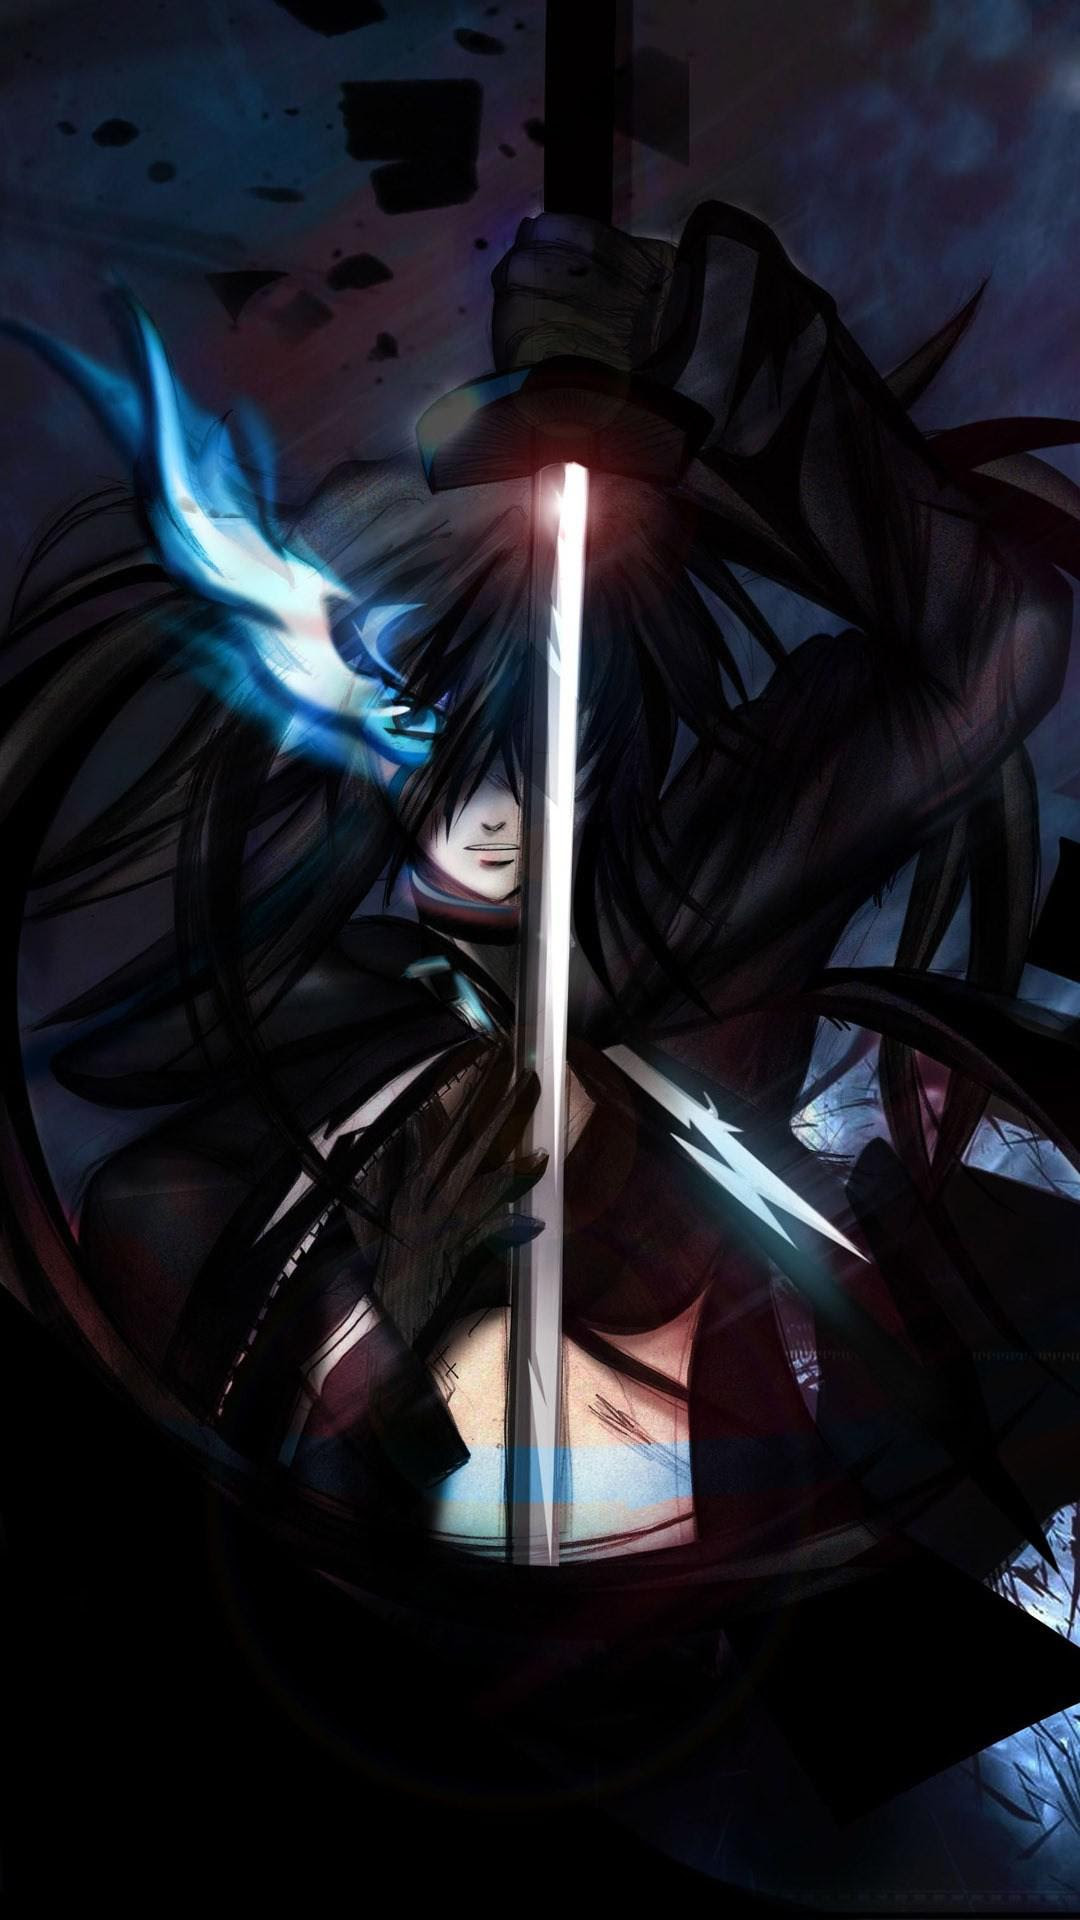 Wallpaper Gambar Anime Cowok Keren - WALLPAPERS